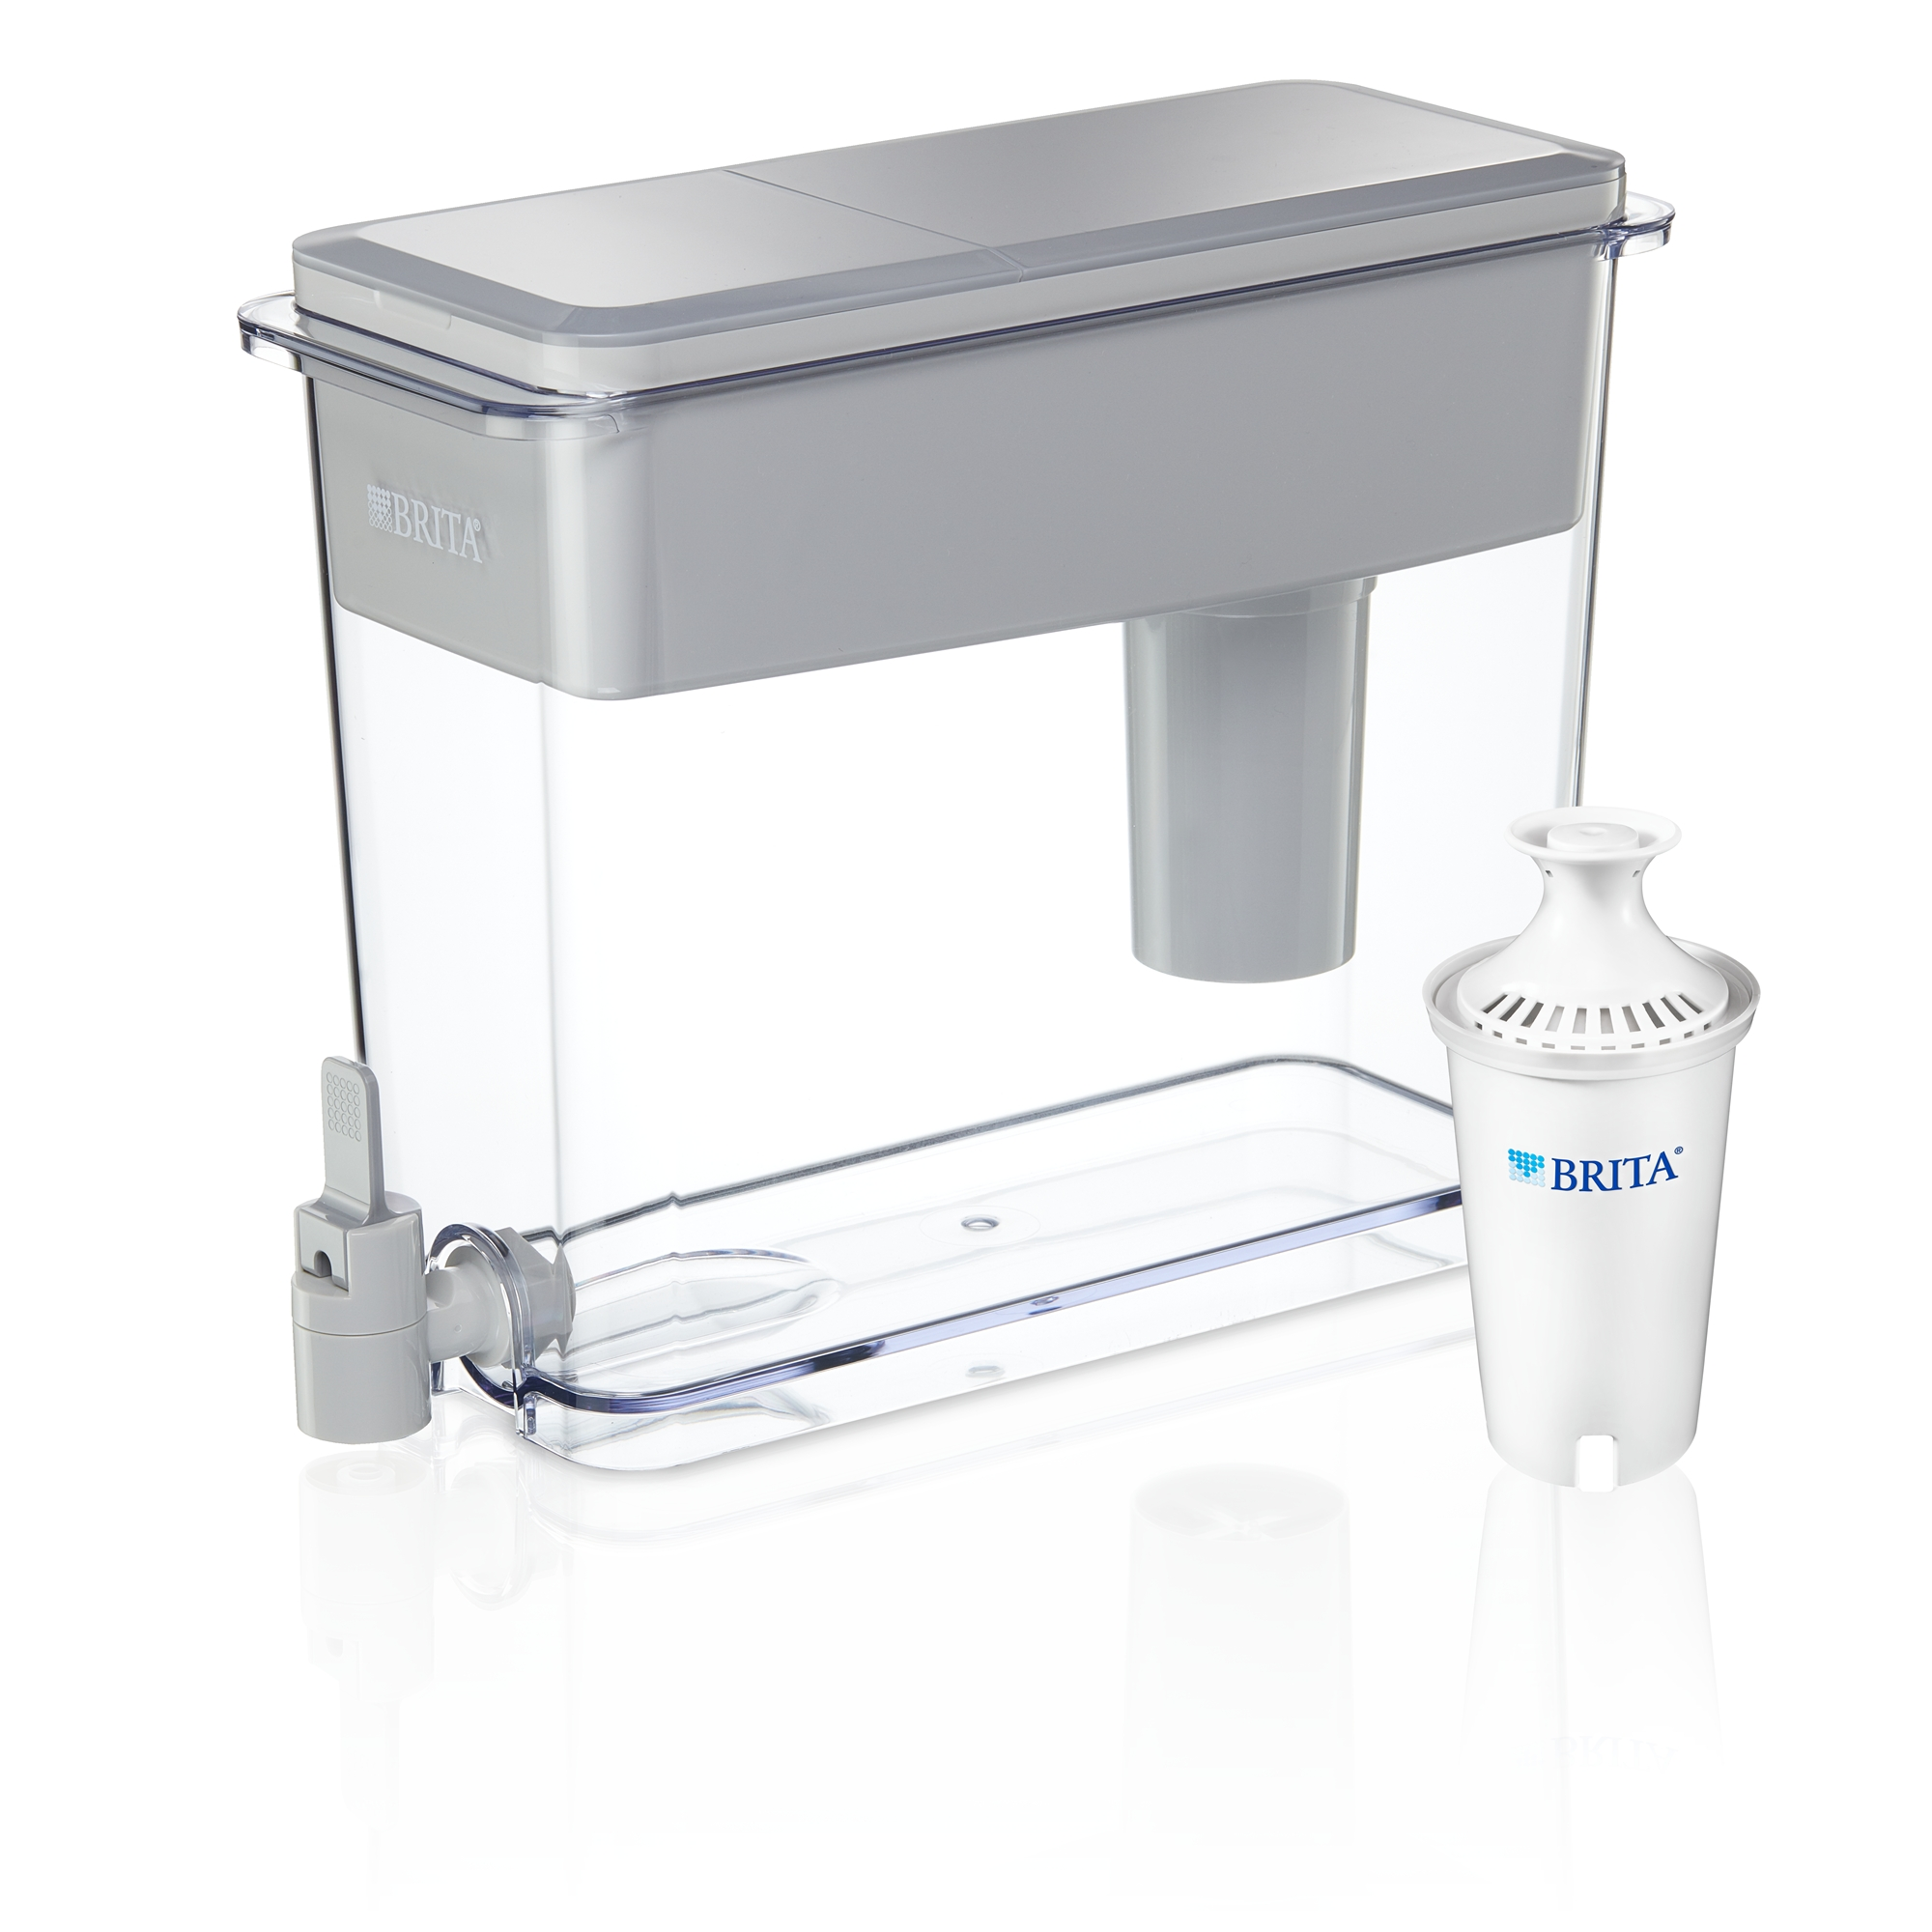 Water Filtration Dispenser Brita 18 Cup Ultramax Water Dispenser With 1 Filter Bpa Free